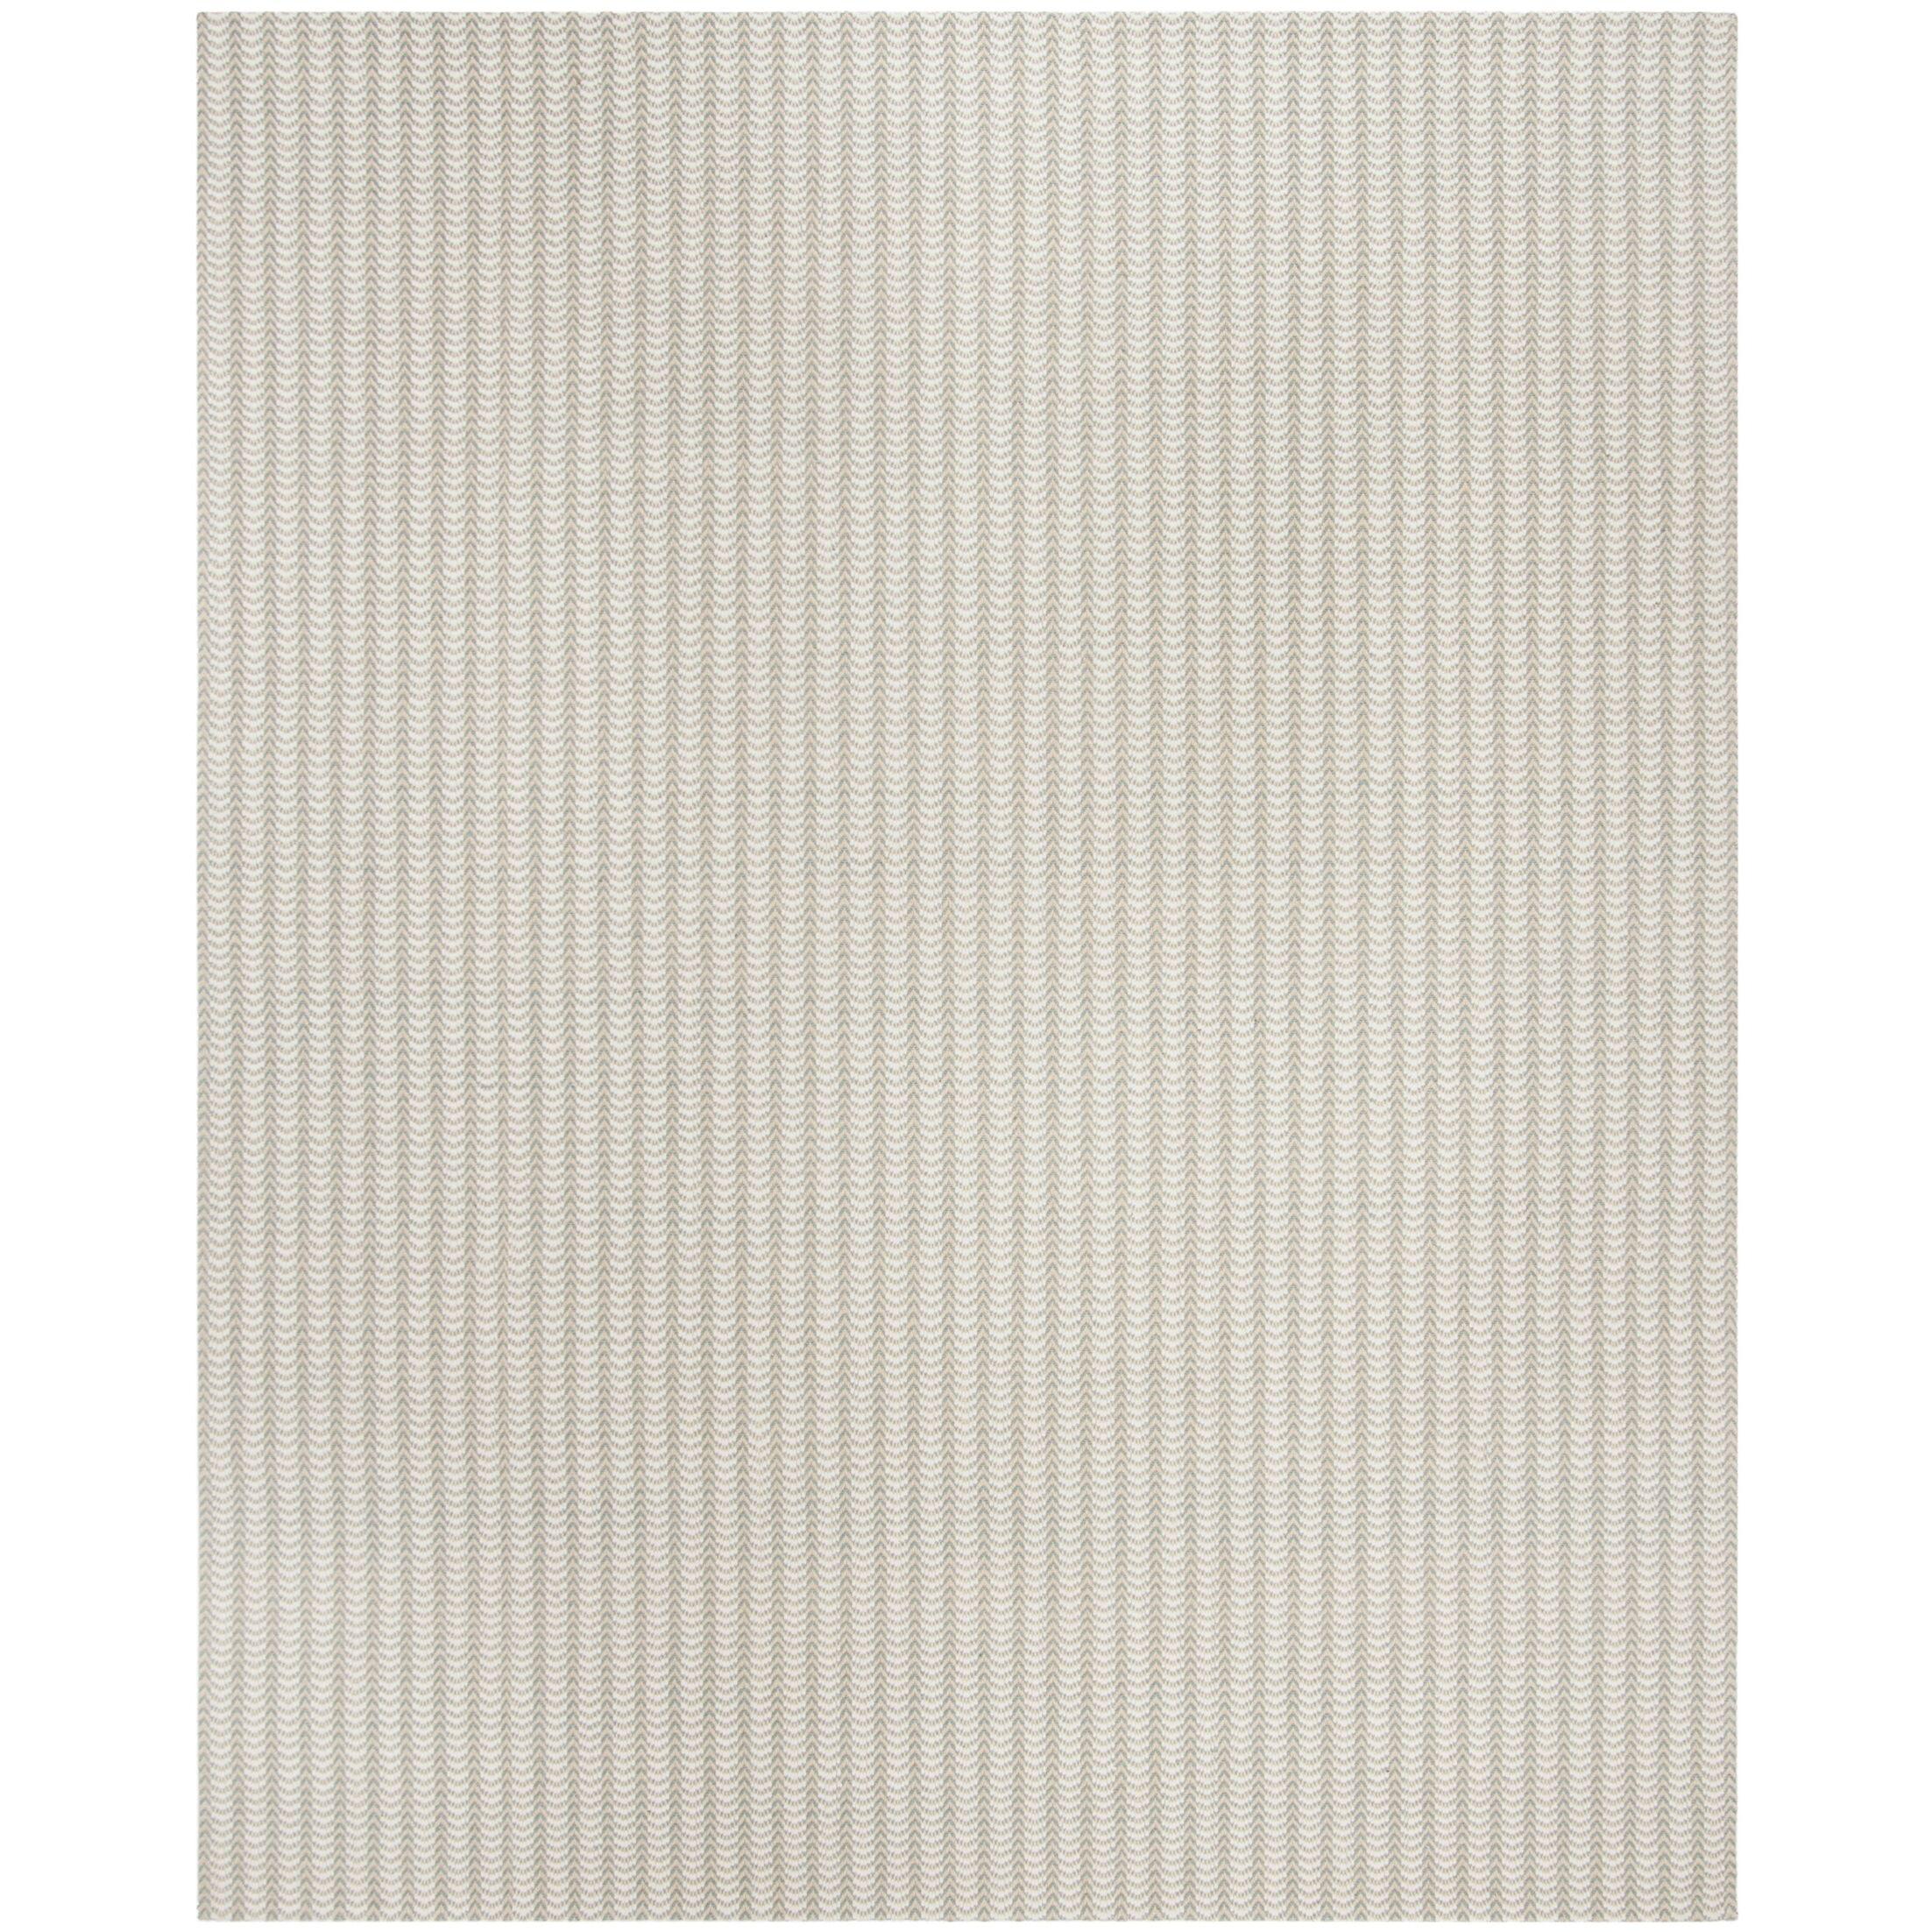 Cherif Versatile Hand Tufted Rectangle Gray Area Rug Rug Size: Rectangle 8' x 10'